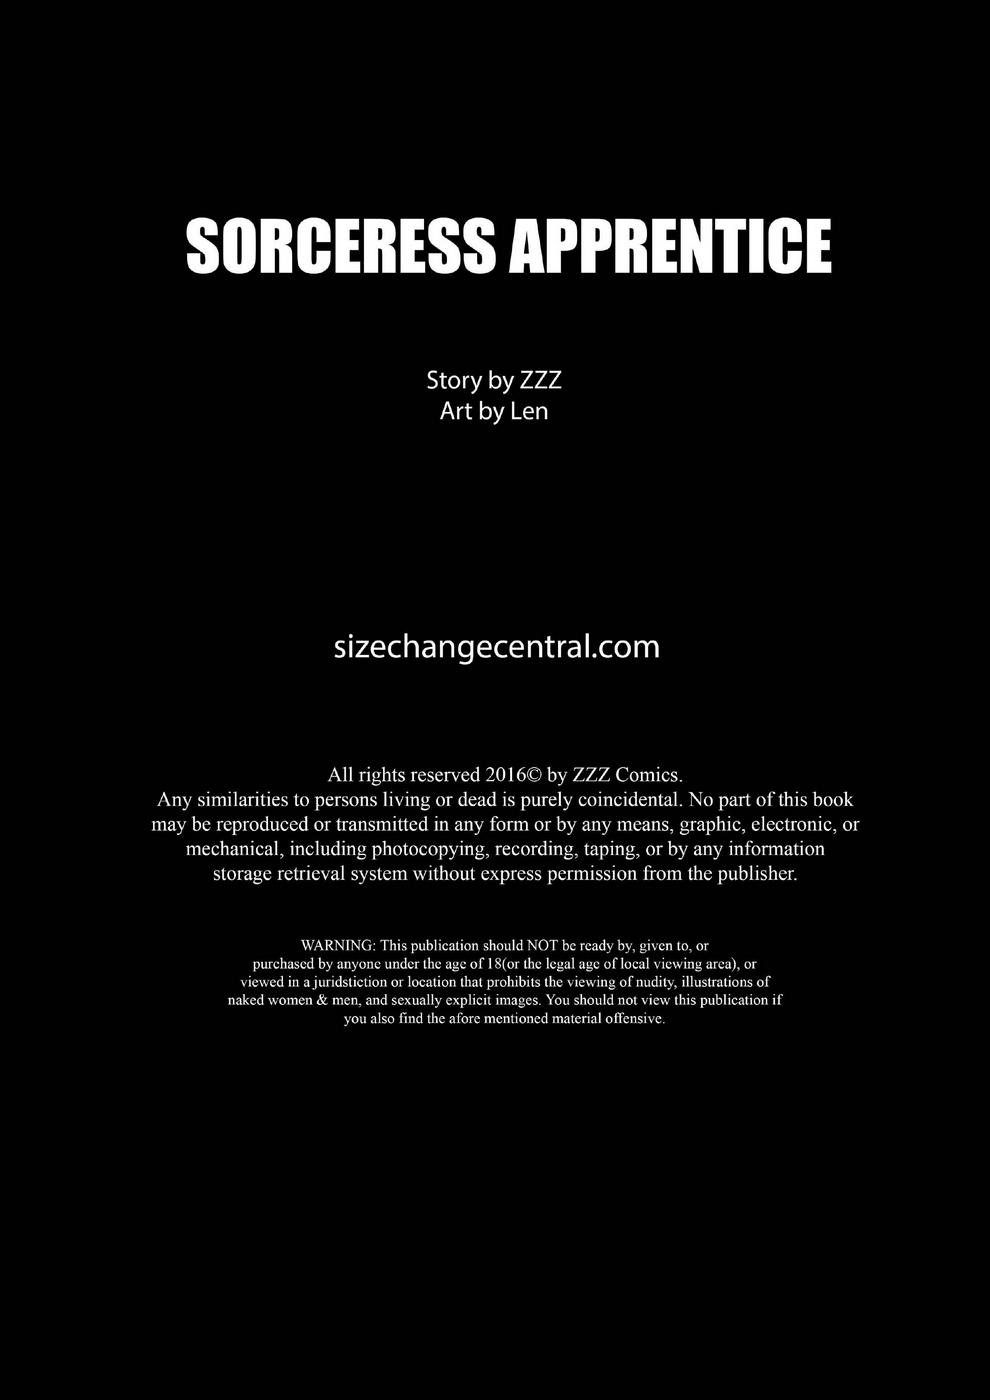 ZZZ- Sorceress Apprentice